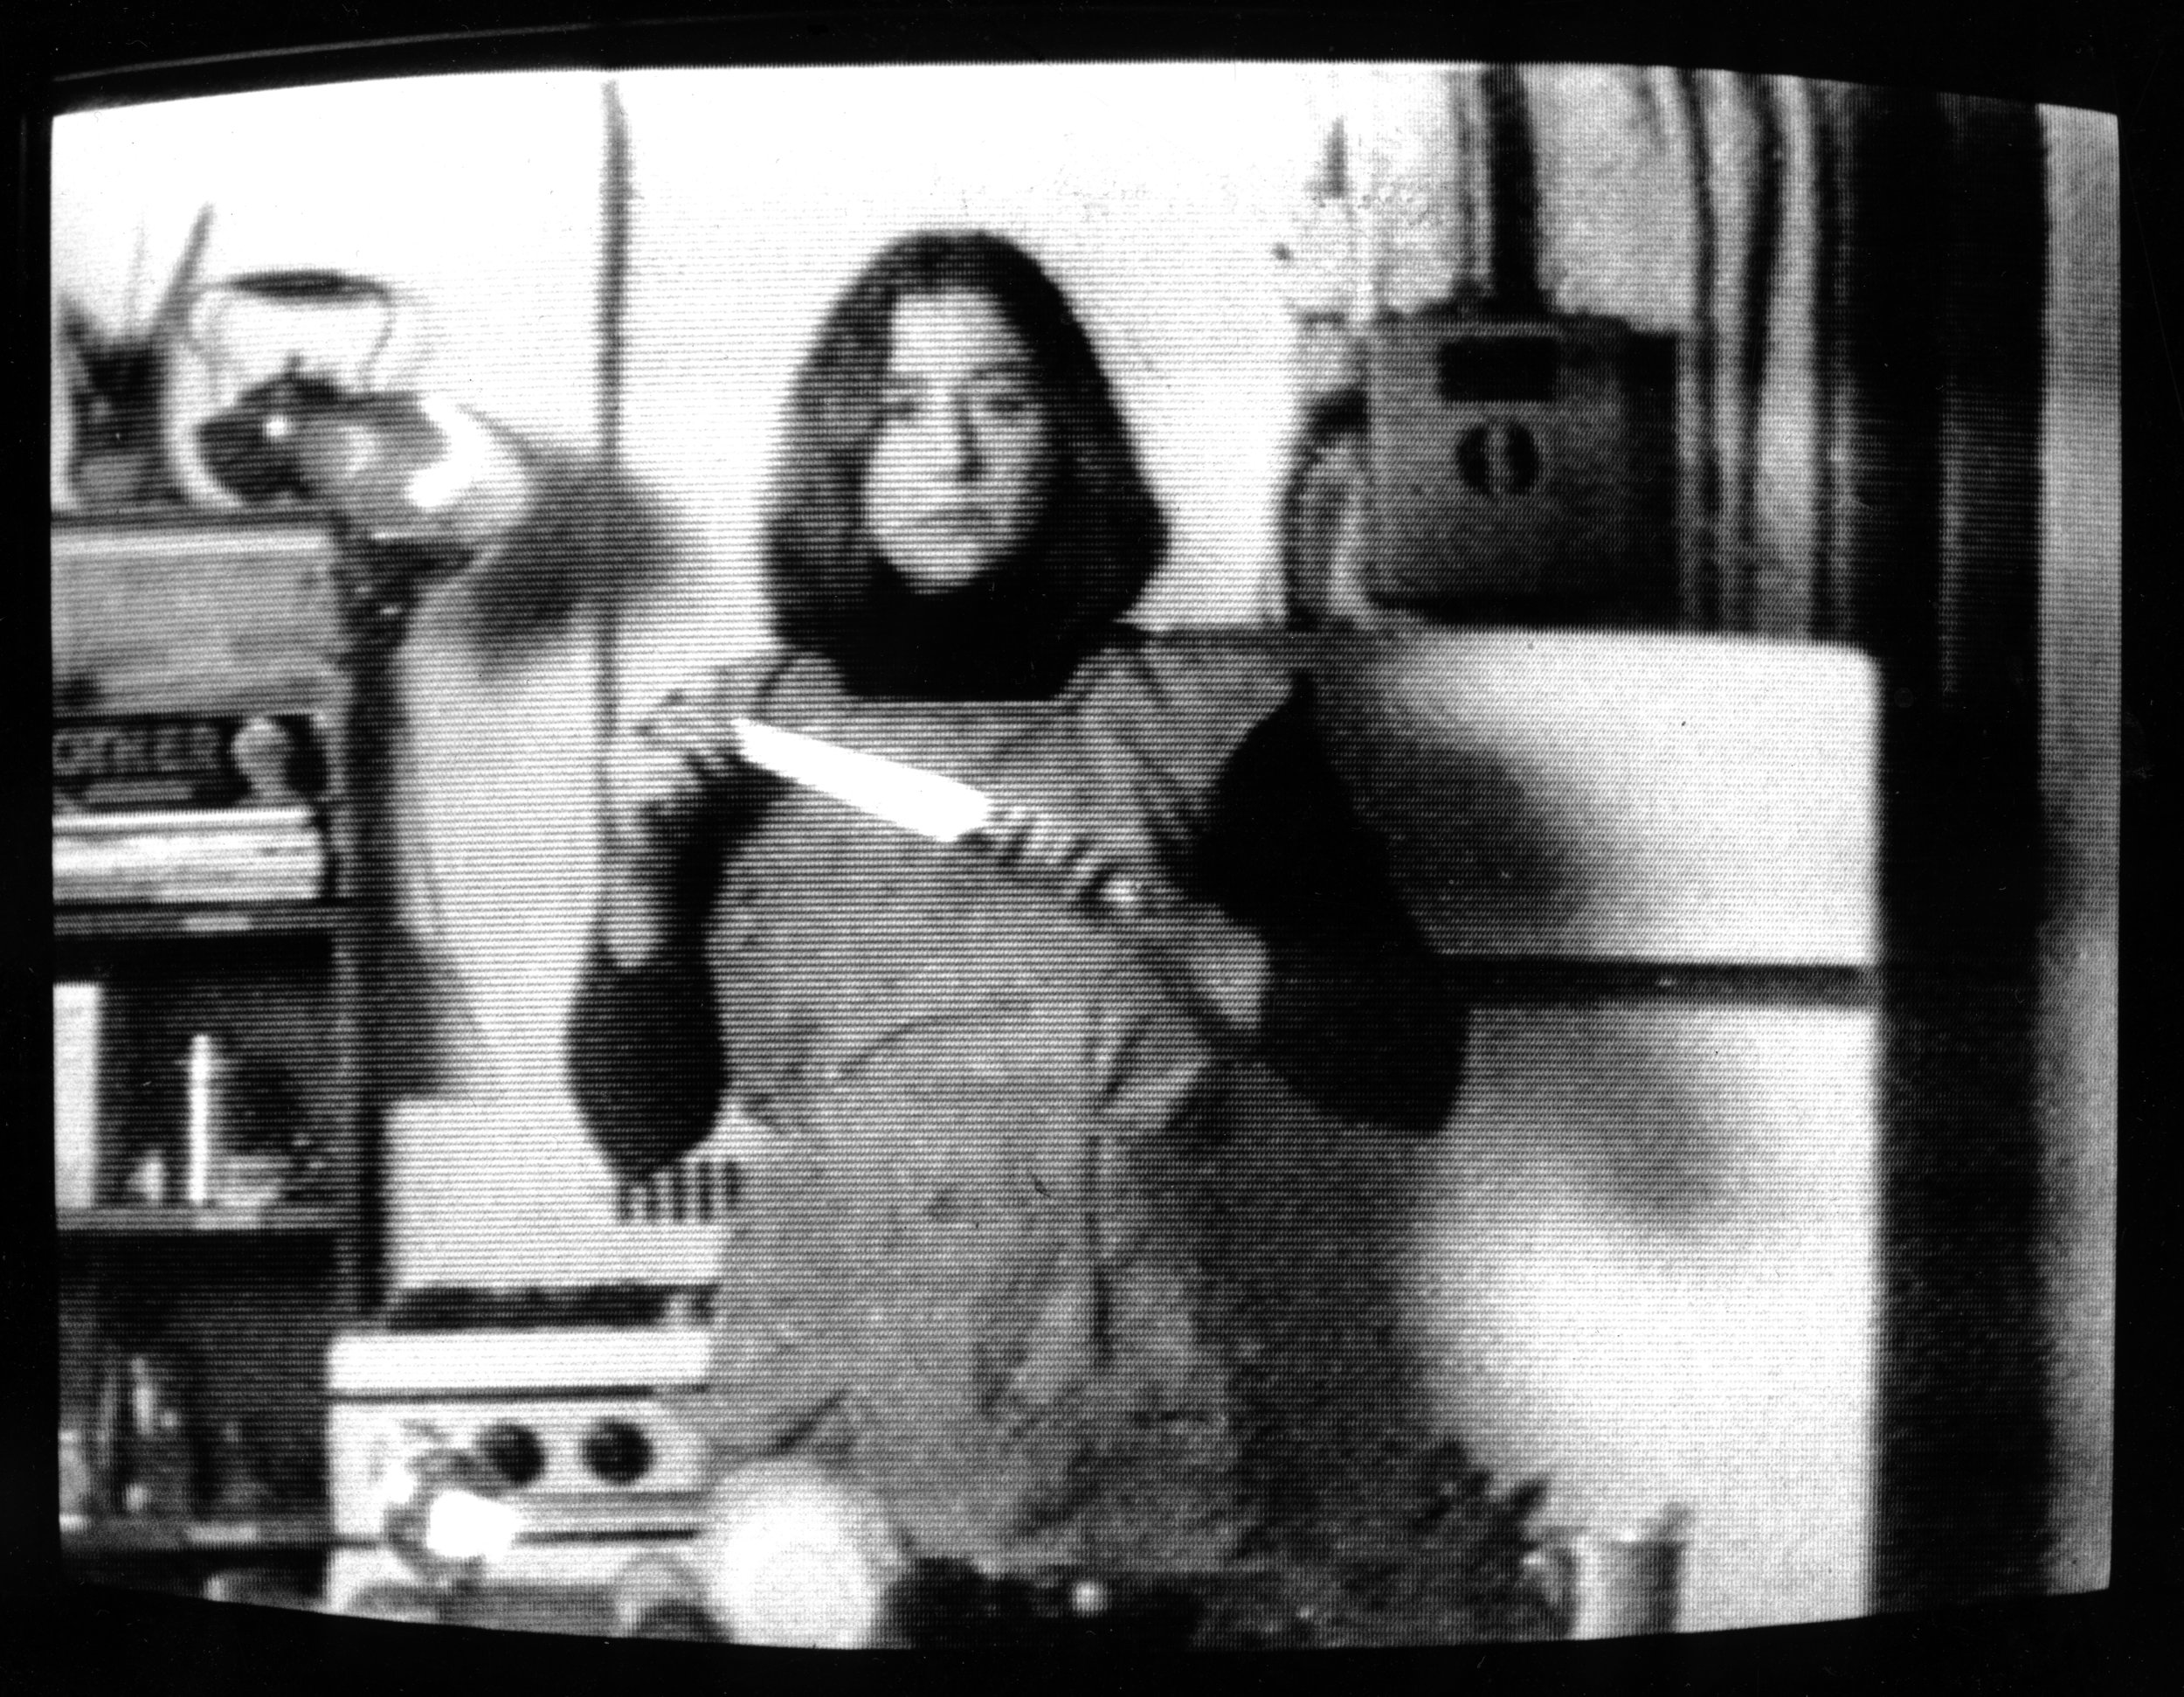 Martha Rosler, still from Semiotics of the Kitchen, 1975, black-and-white video, 6 min., 30 sec. Artwork © Martha Rosler